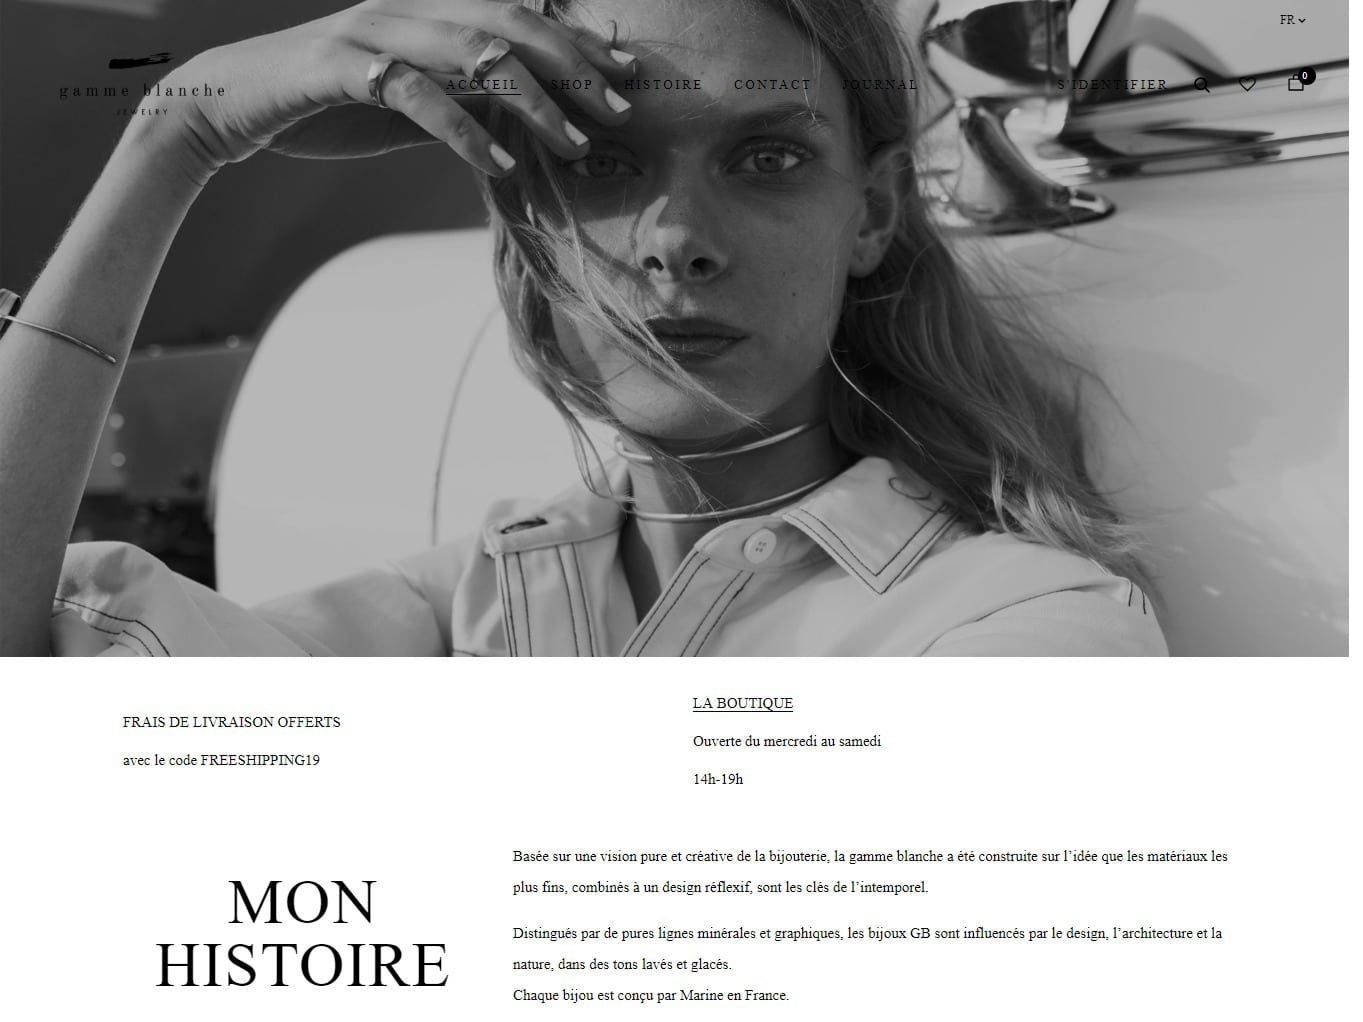 accueil_gamme_blanche_vignette